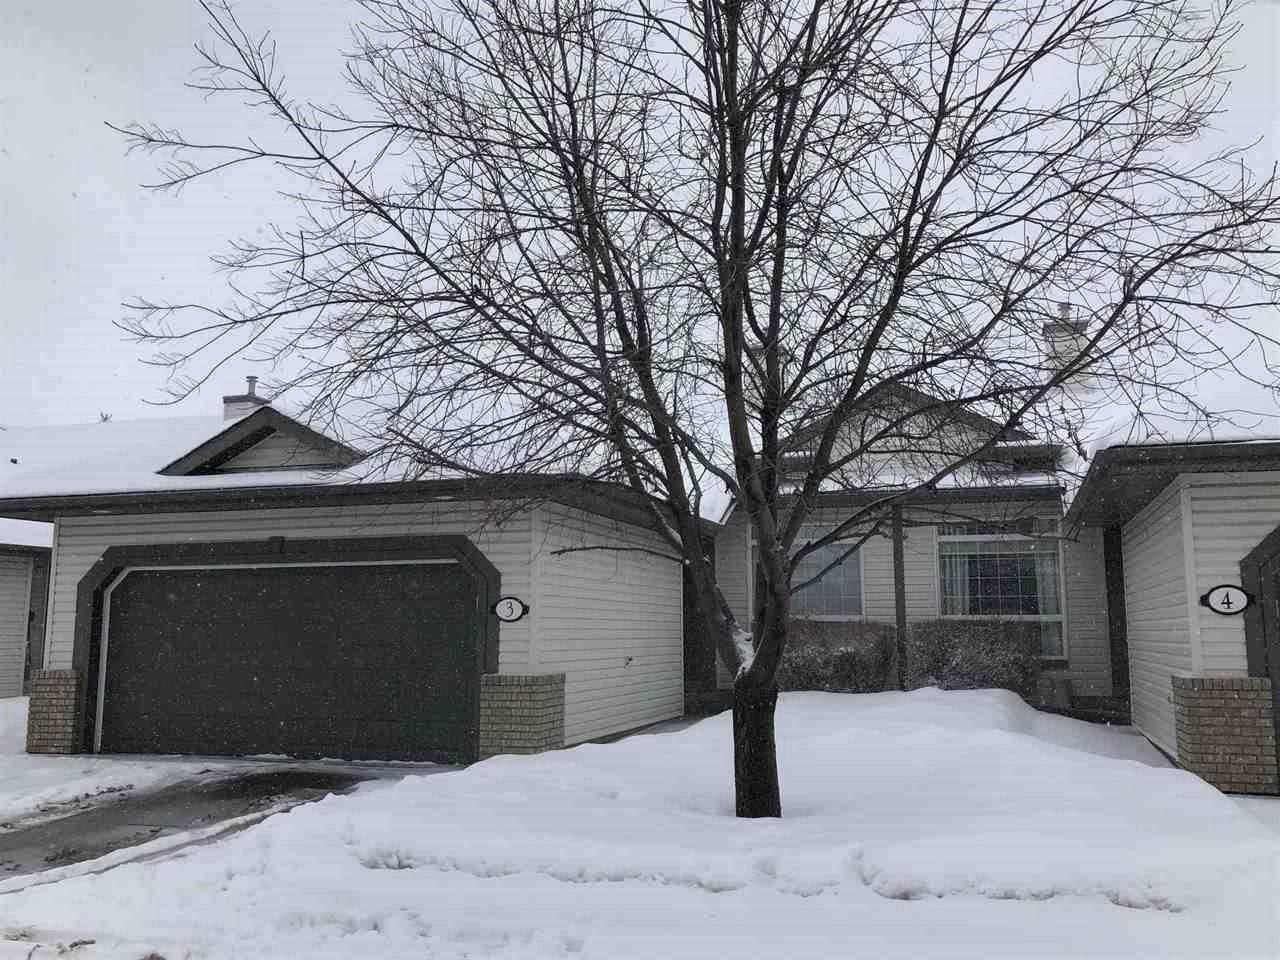 Townhouse for sale at 1752 Glastonbury Blvd Nw Unit 3 Edmonton Alberta - MLS: E4187503